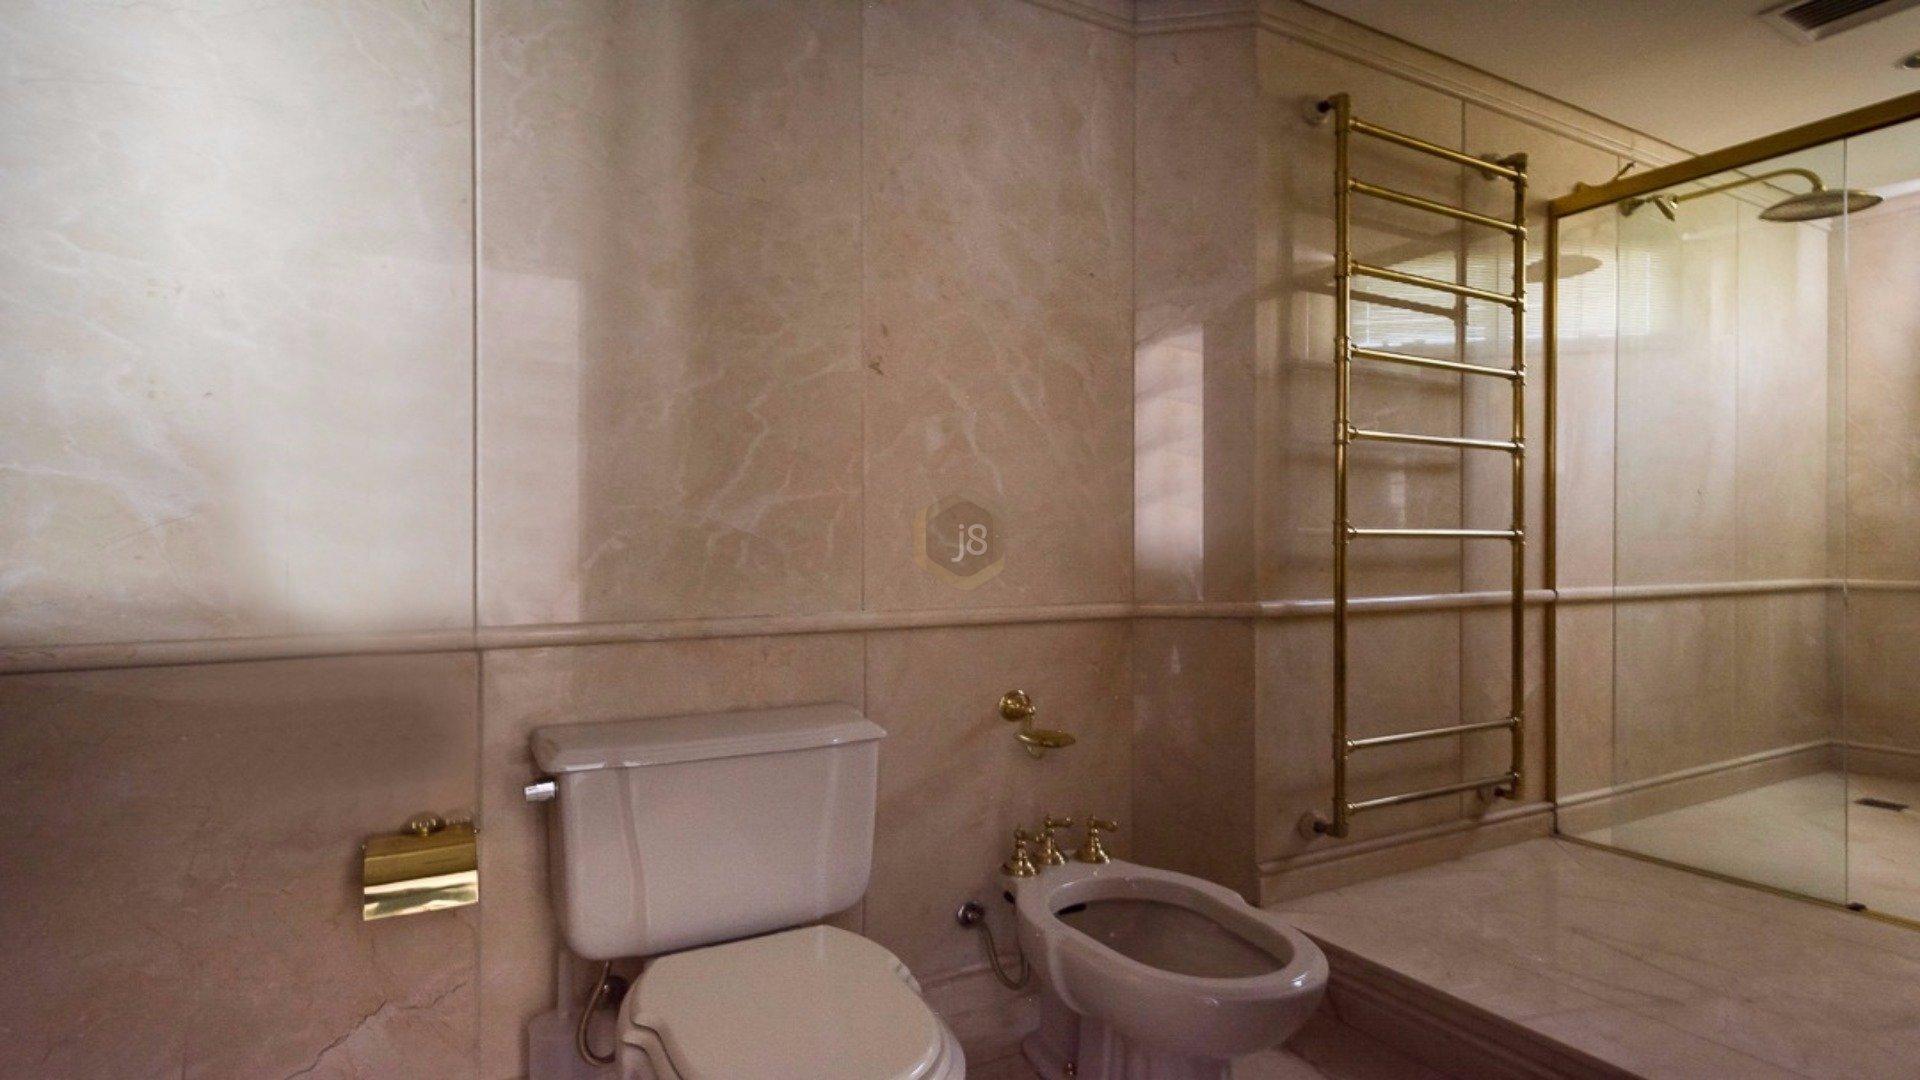 Apartamentos De 4 Dormit Rios Para Alugar Em Gua Verde Curitiba